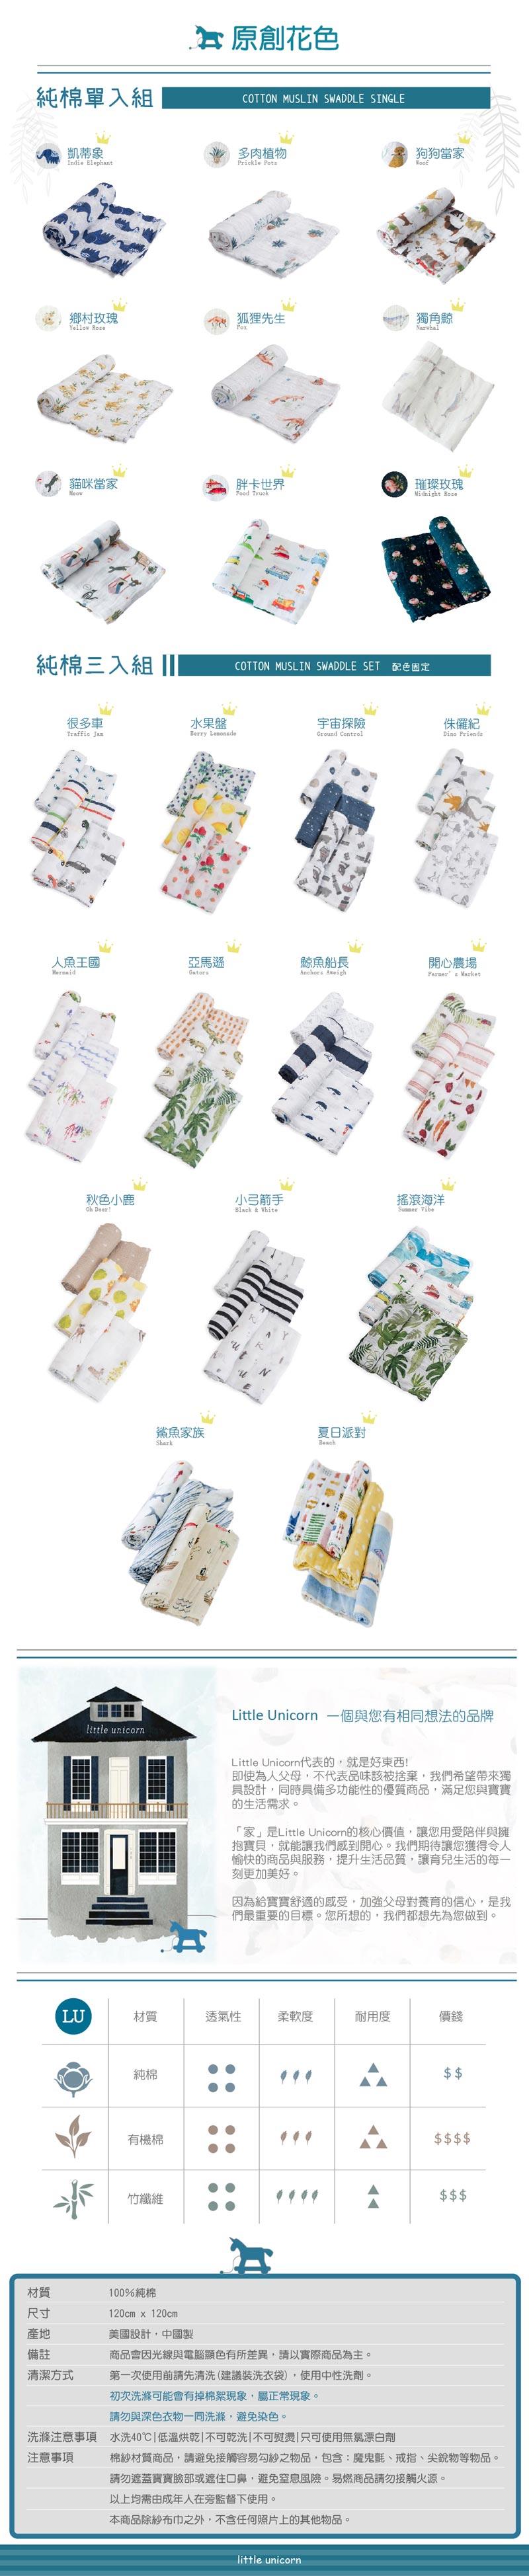 LittleUnicorn 純棉紗布巾info02